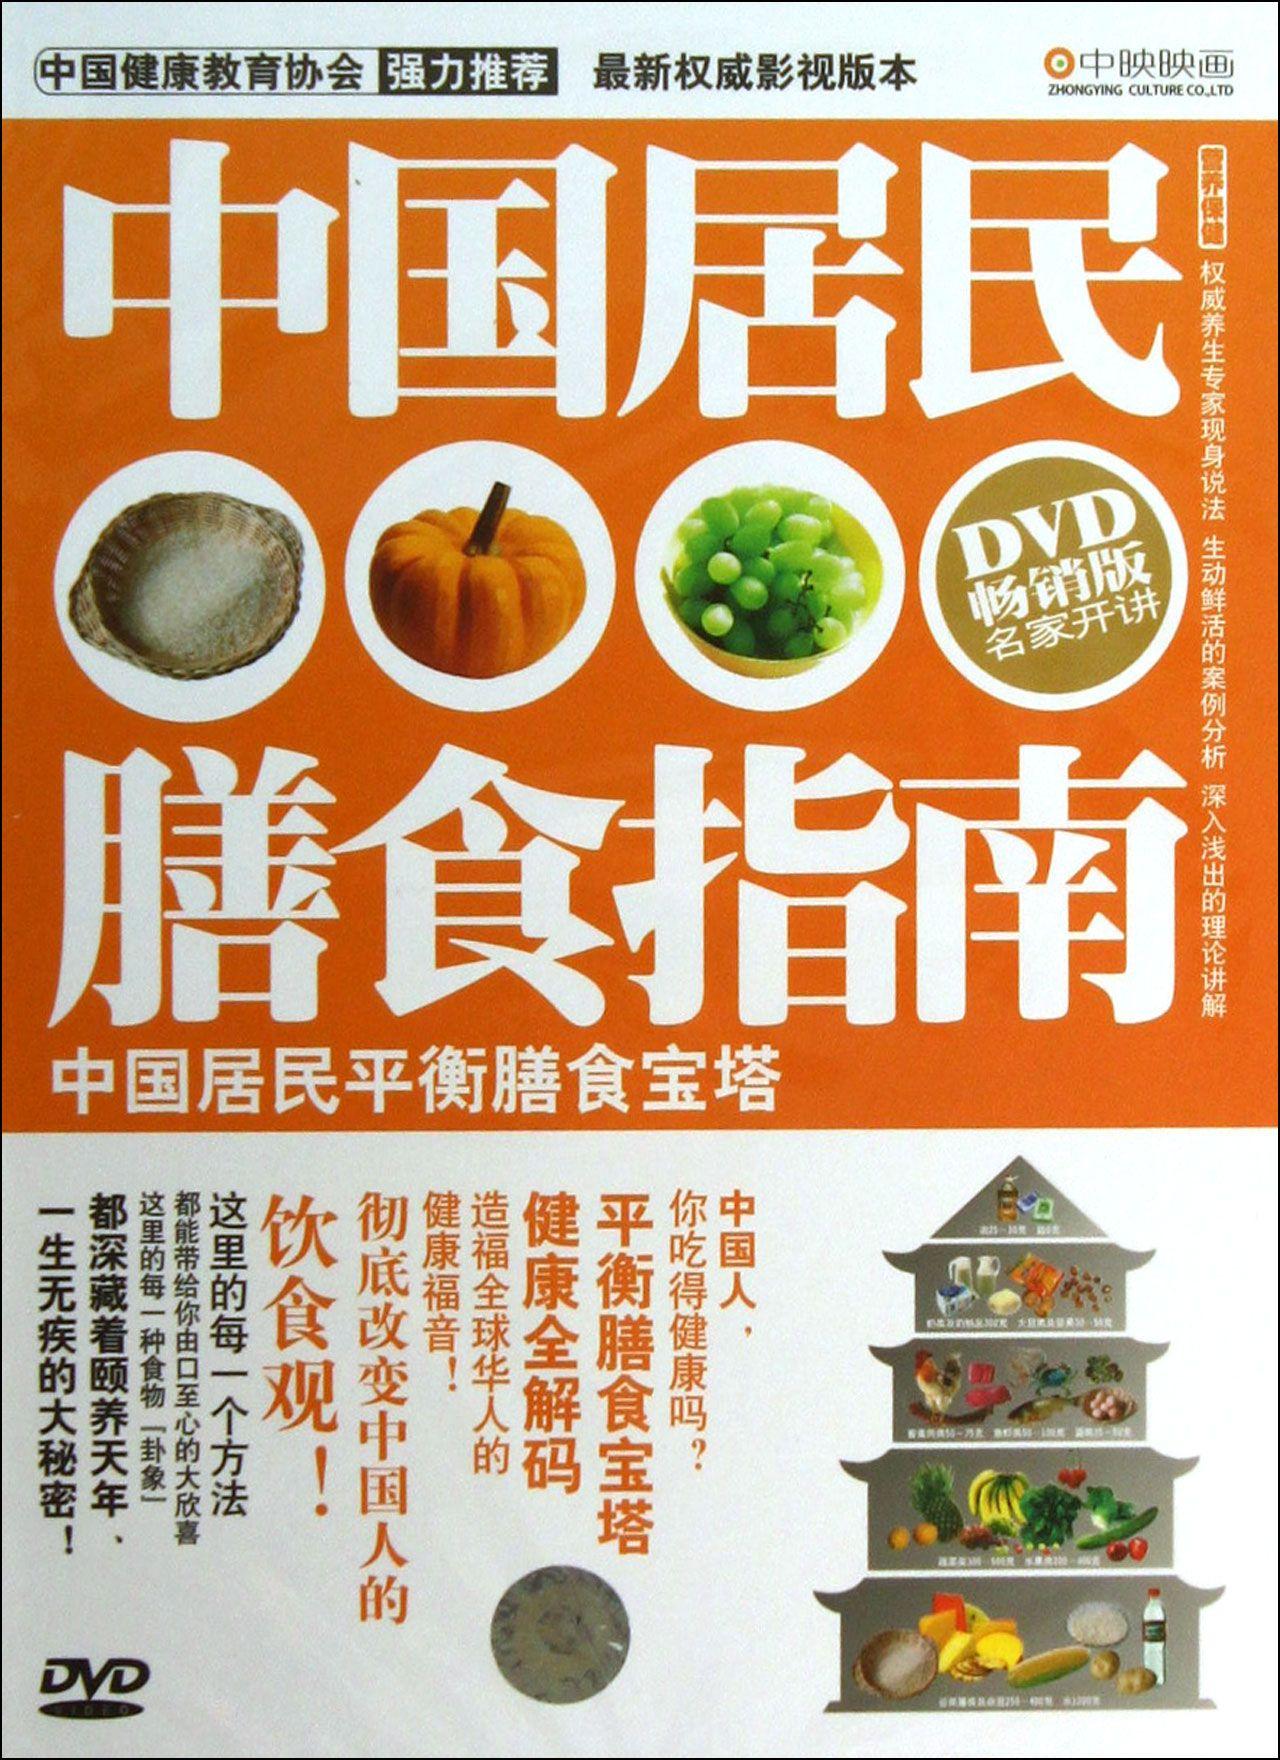 dvd中国居民膳食指南(水晶版)